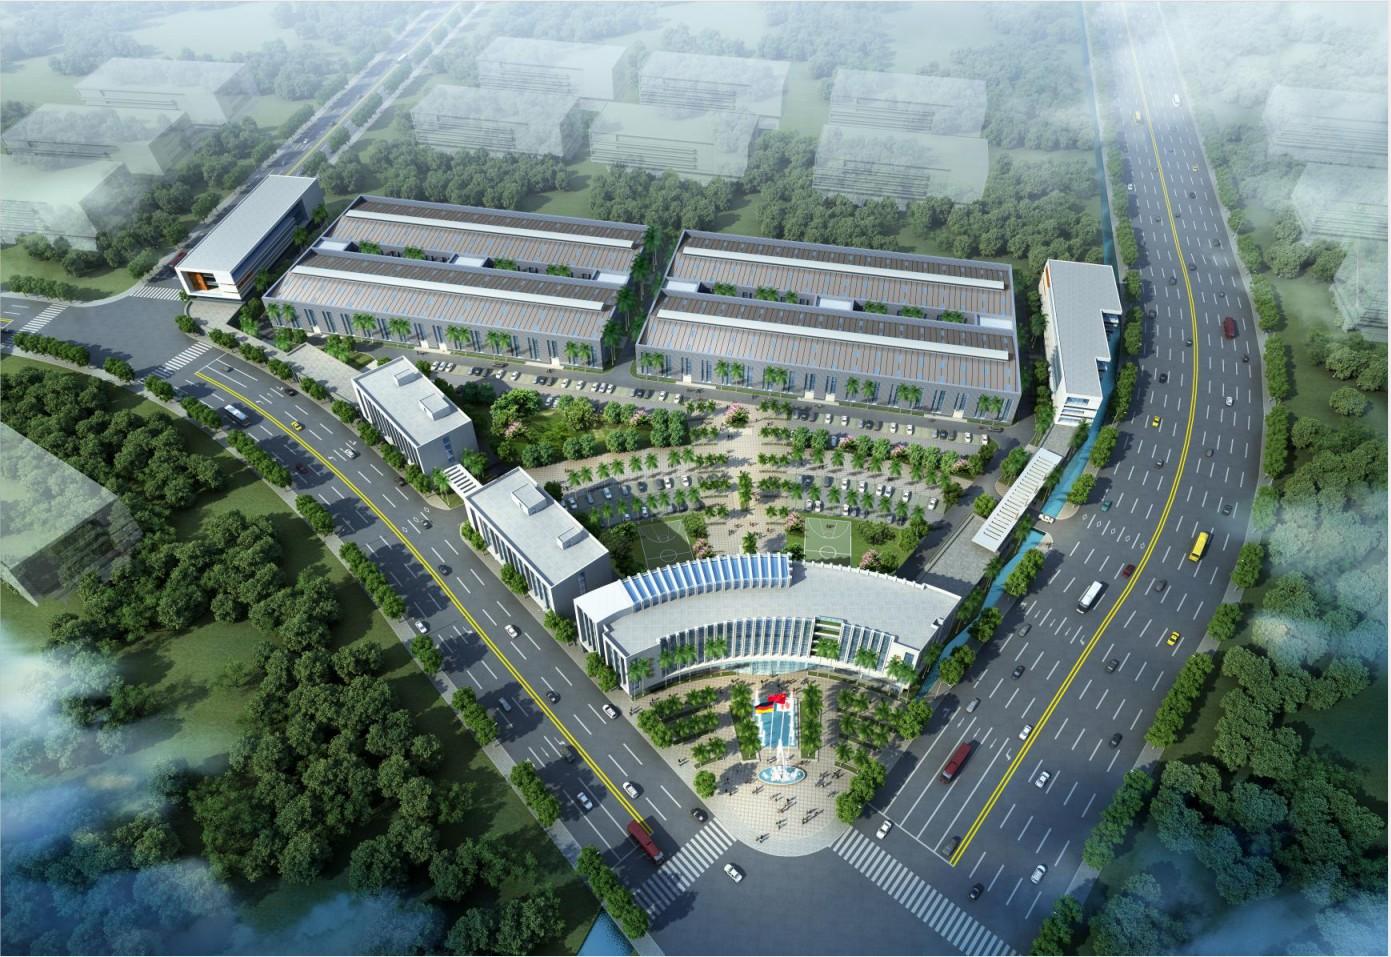 Guangdong Huayu Technology Co., Ltd